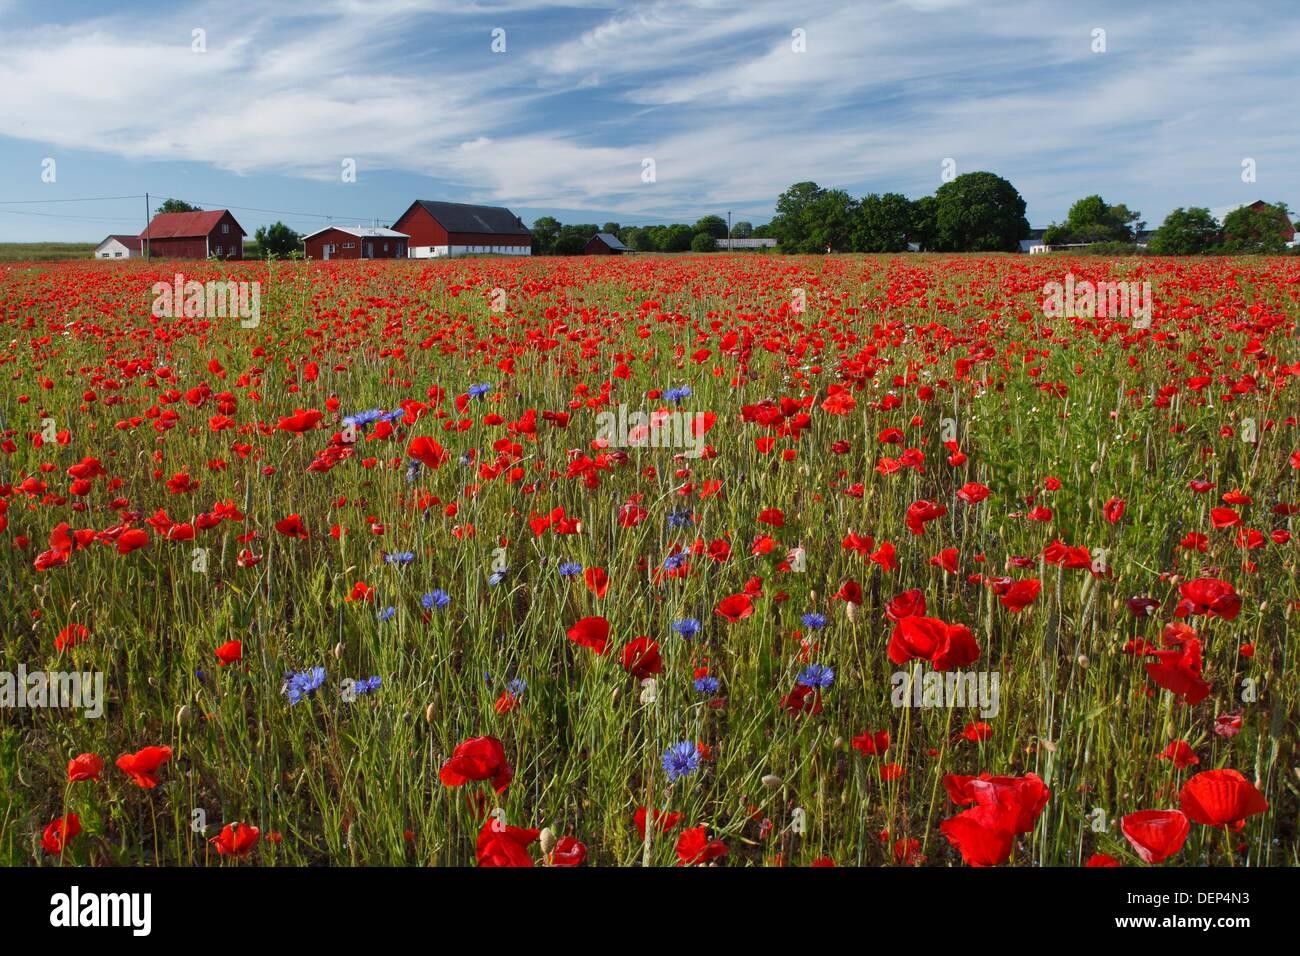 Prado florido Gotland Suecia. Imagen De Stock